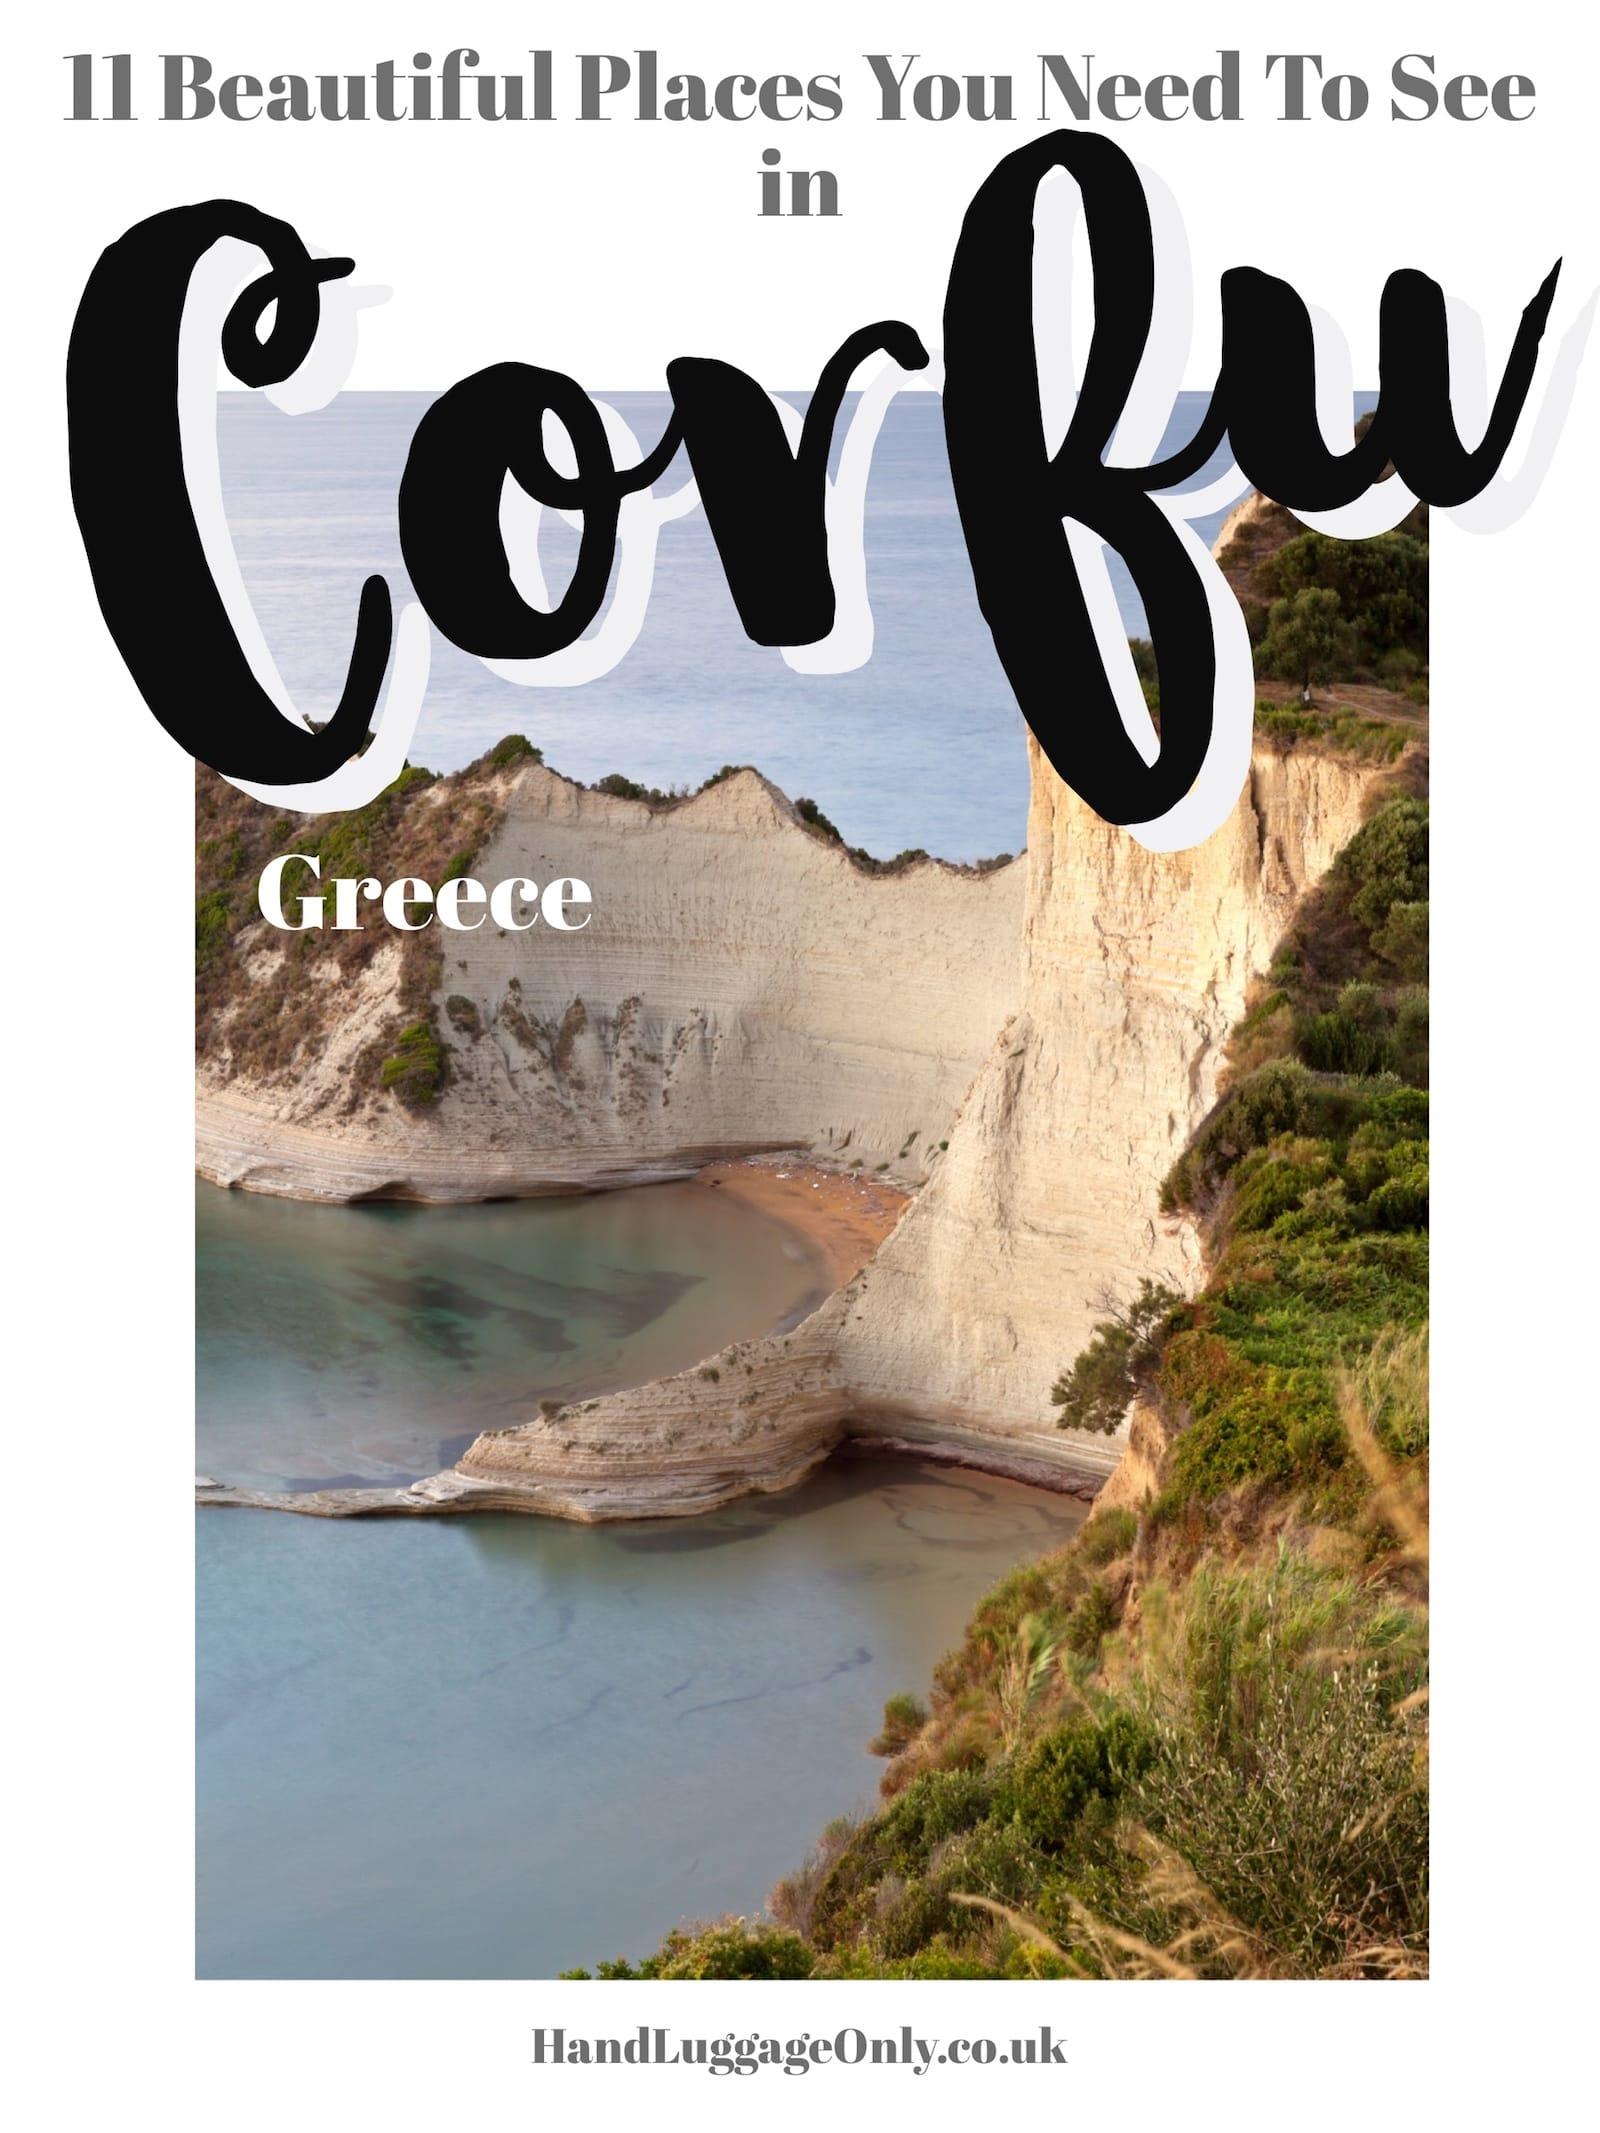 11 Beautiful Places You Need To See In Corfu, Greece (19)